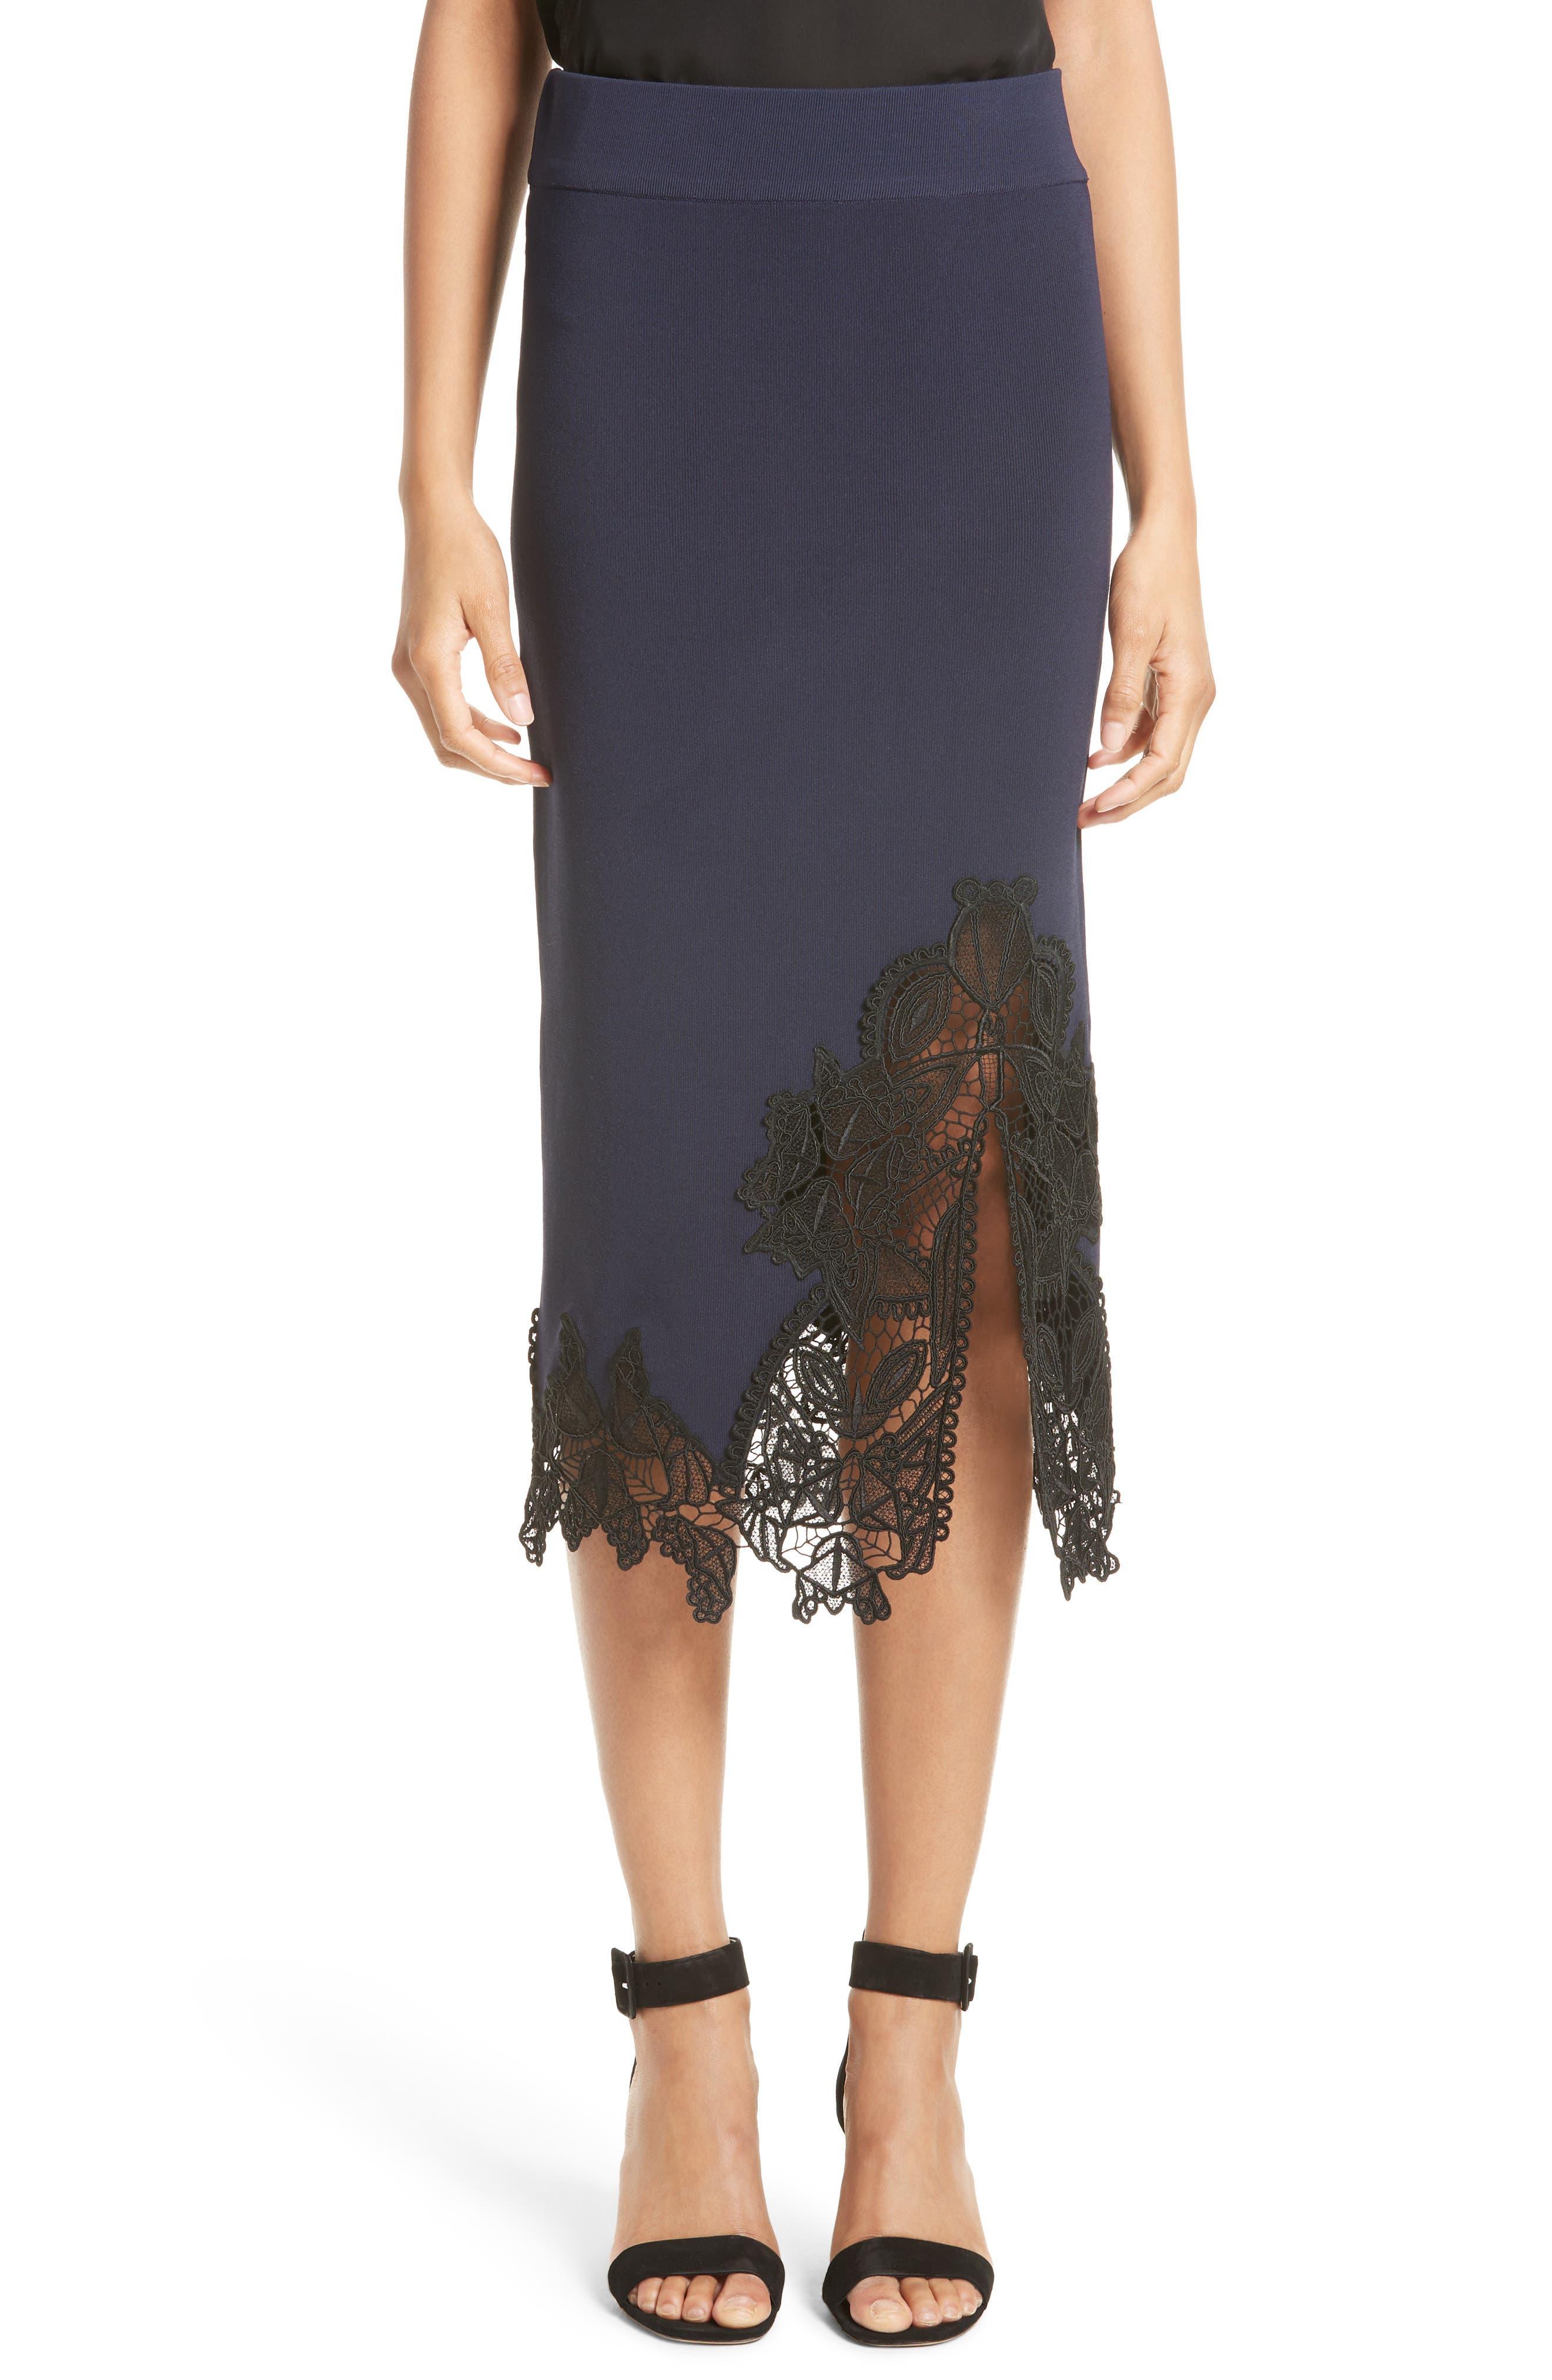 Jonathan Simkhai Lace Appliqué Knit Pencil Skirt